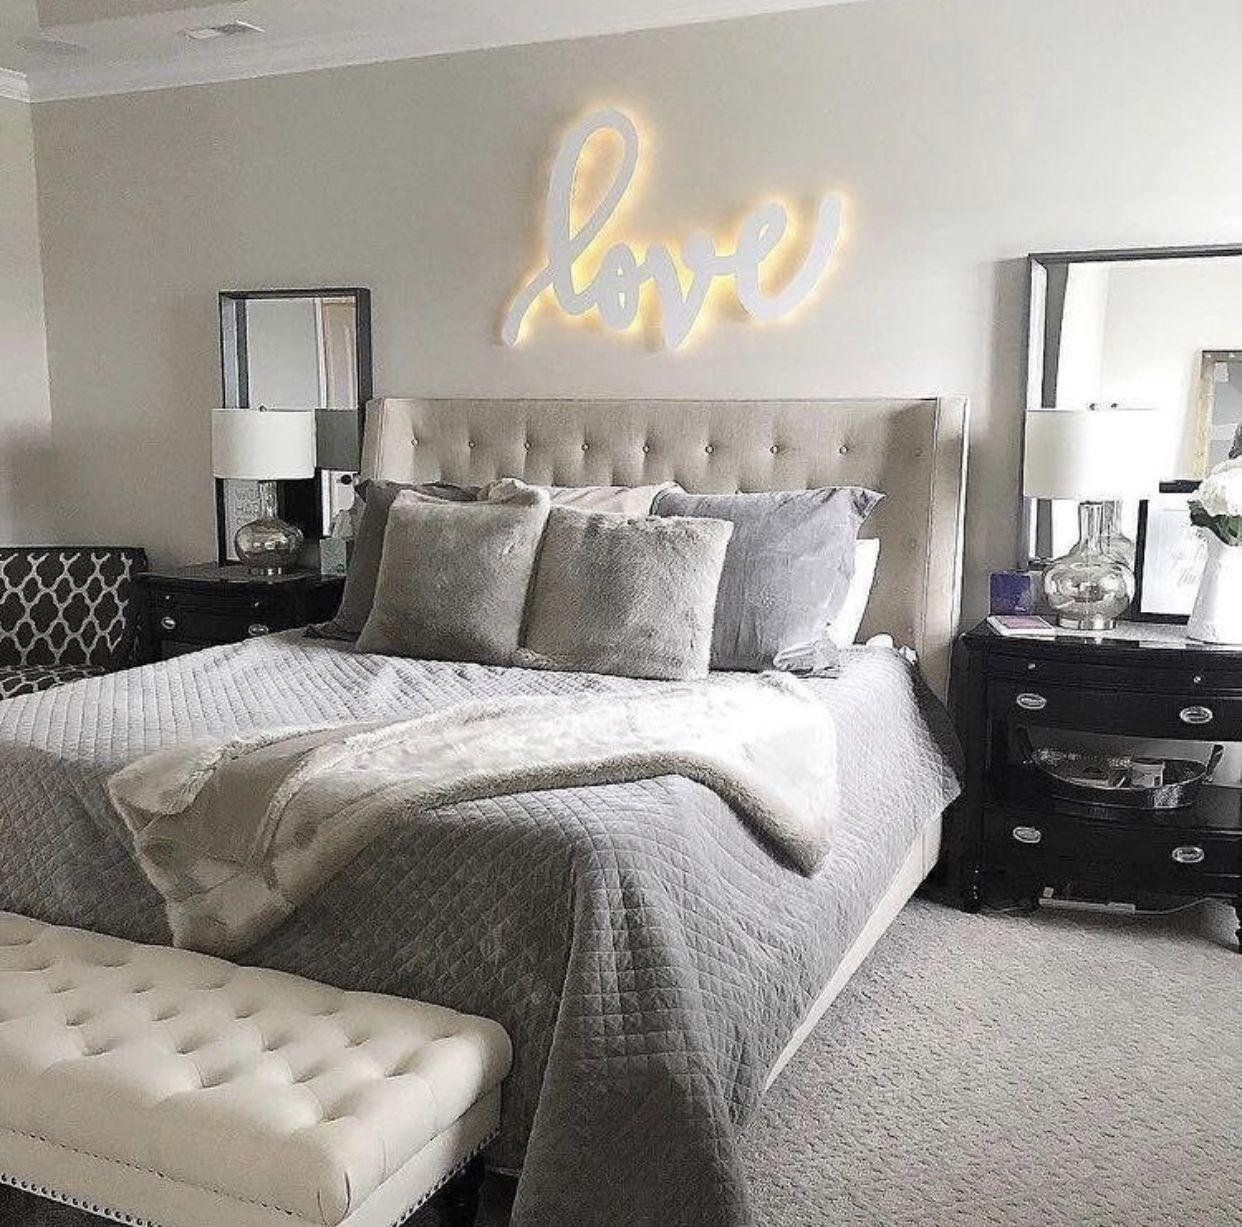 pinterest  𝓪𝓼𝓱𝓵𝓮𝔂𝓷𝔁𝓸𝔁𝓸  girl bedroom decor bedroom